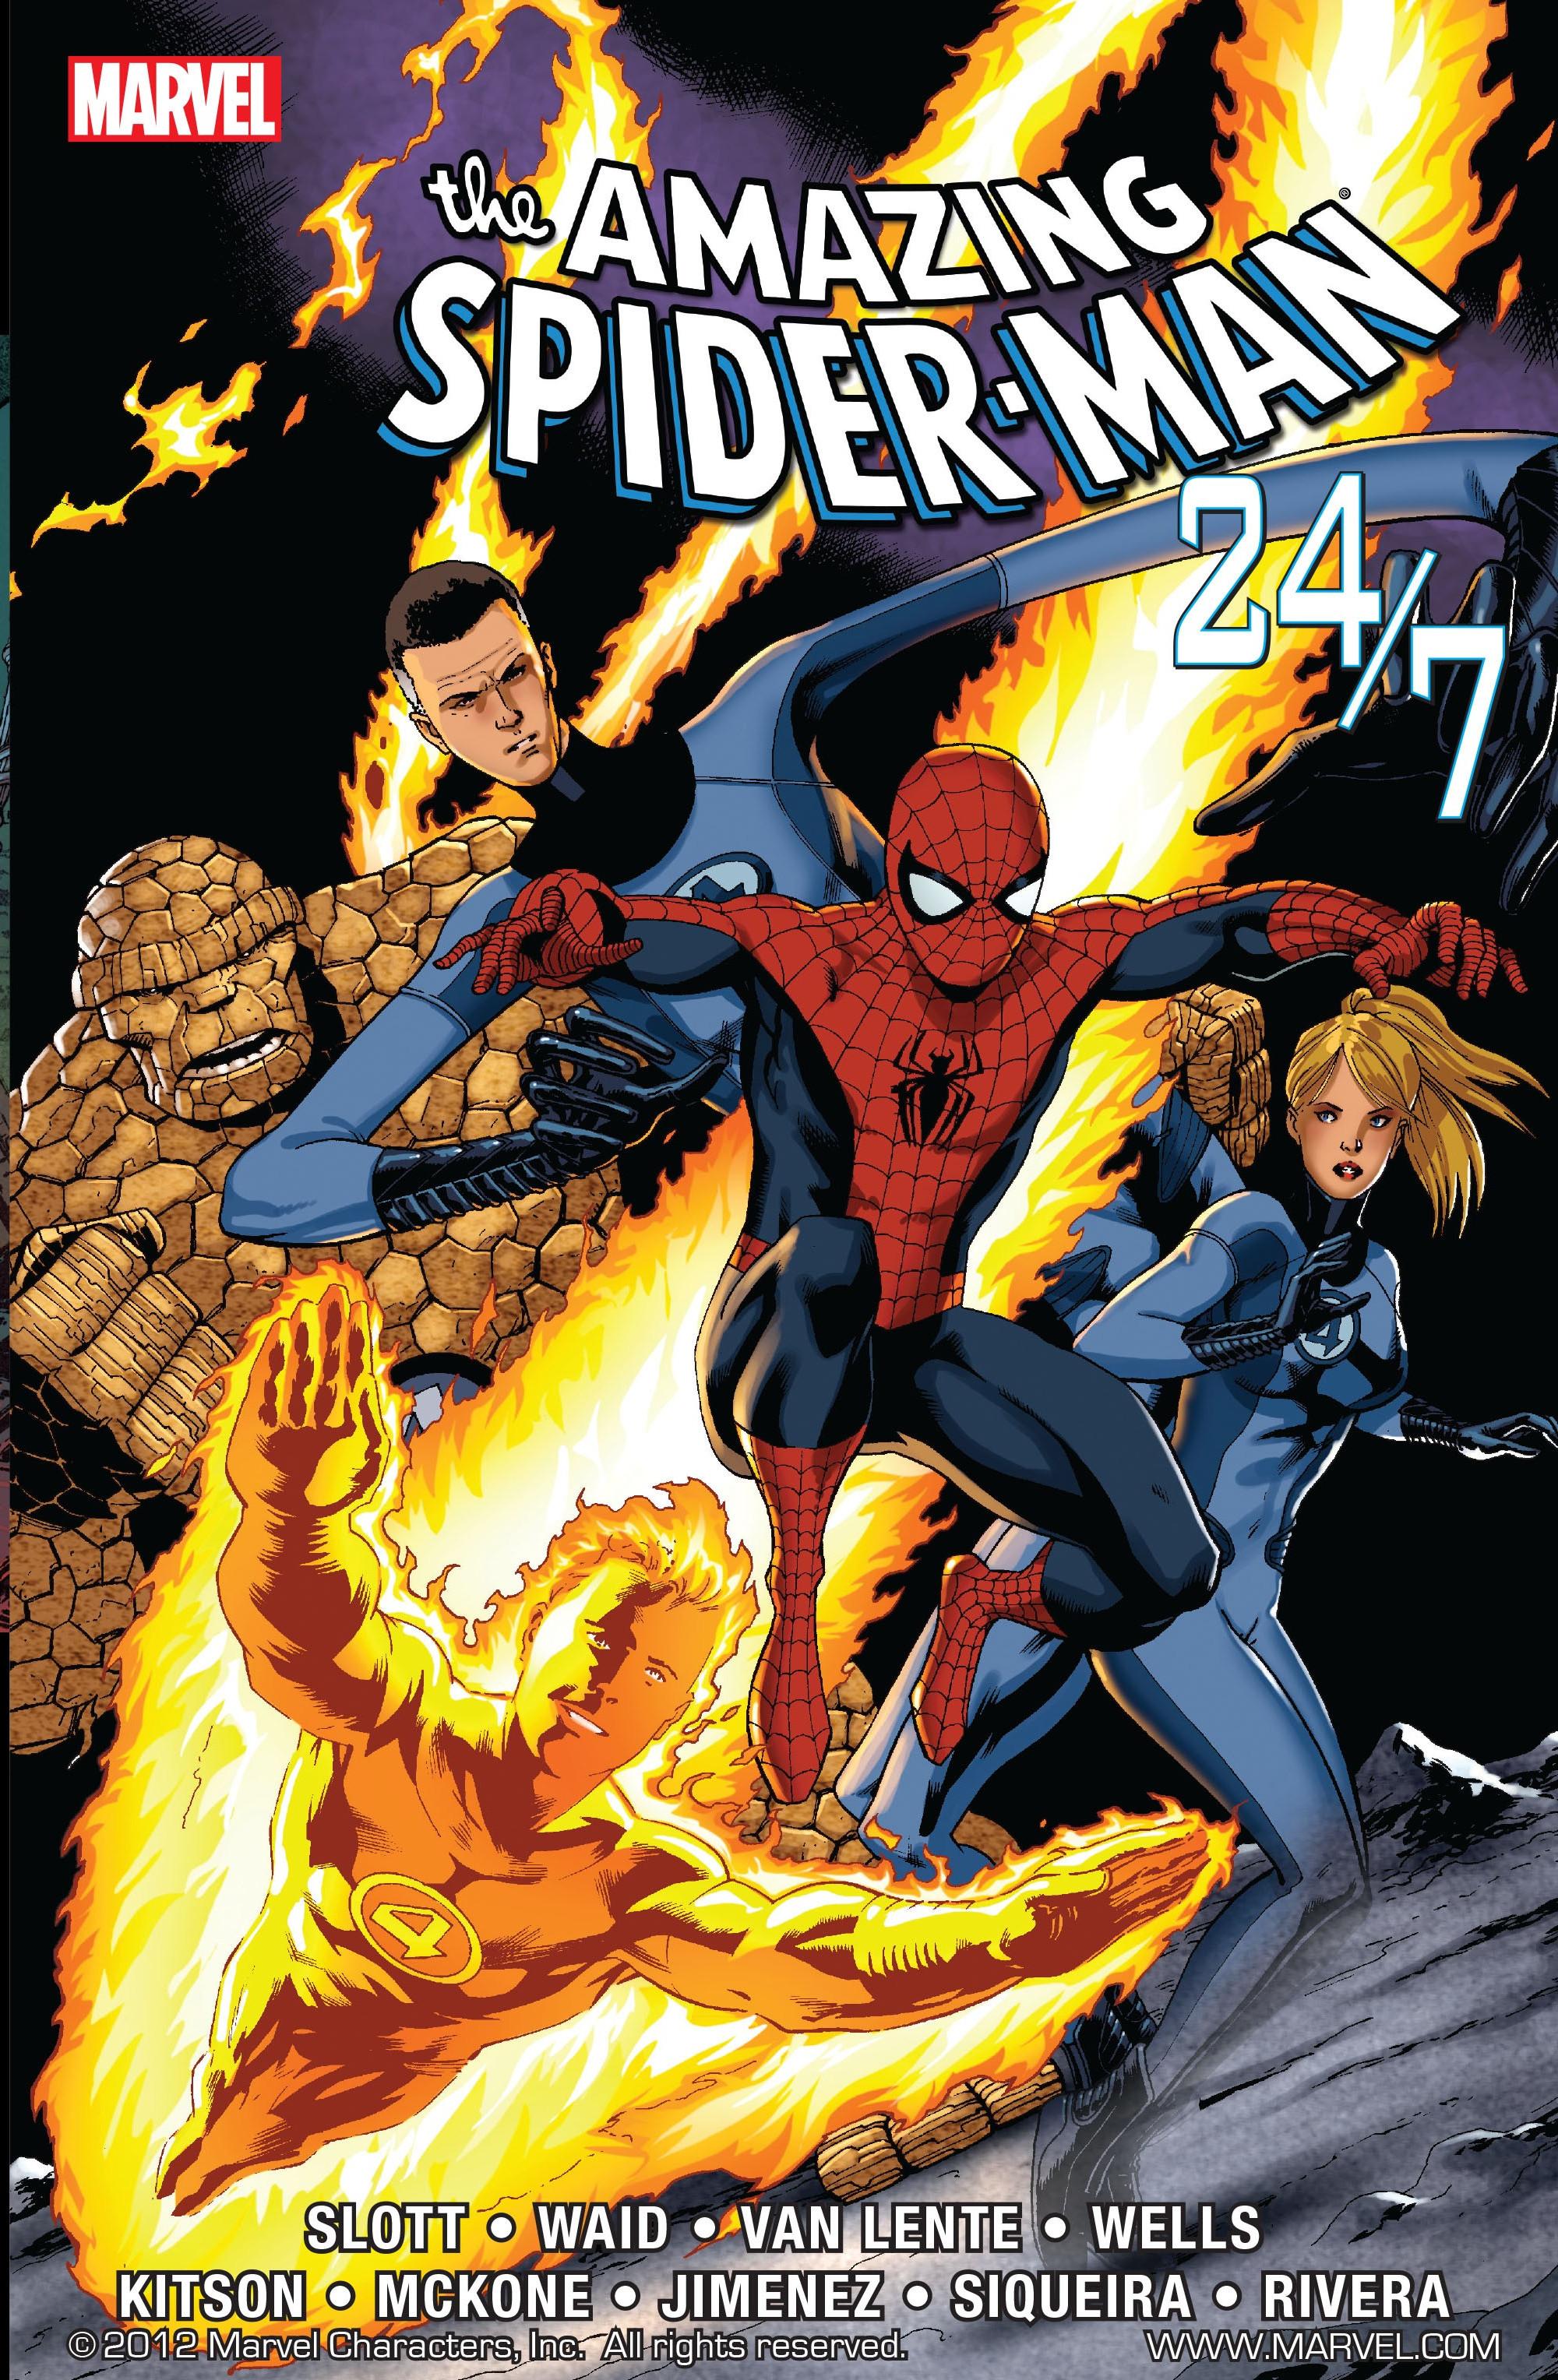 Amazing Spider-Man 24/7 TPB Vol 1